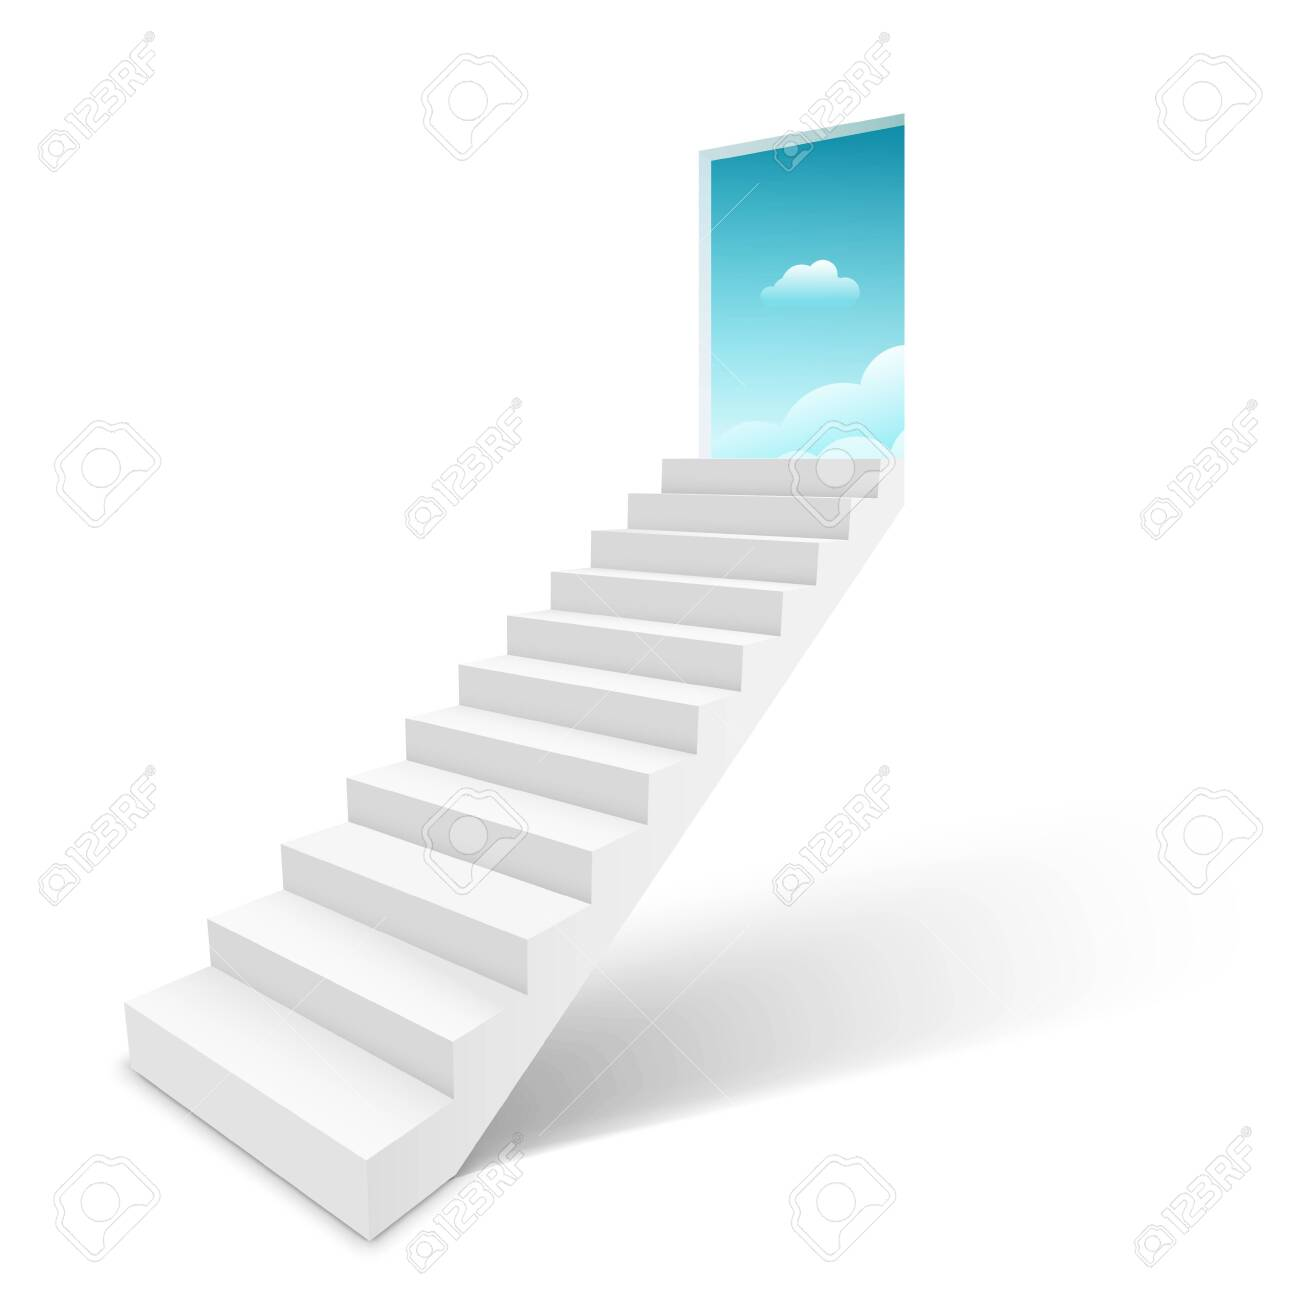 Stairway with open door heaven, ladder staircase to sky concept. - 133433846